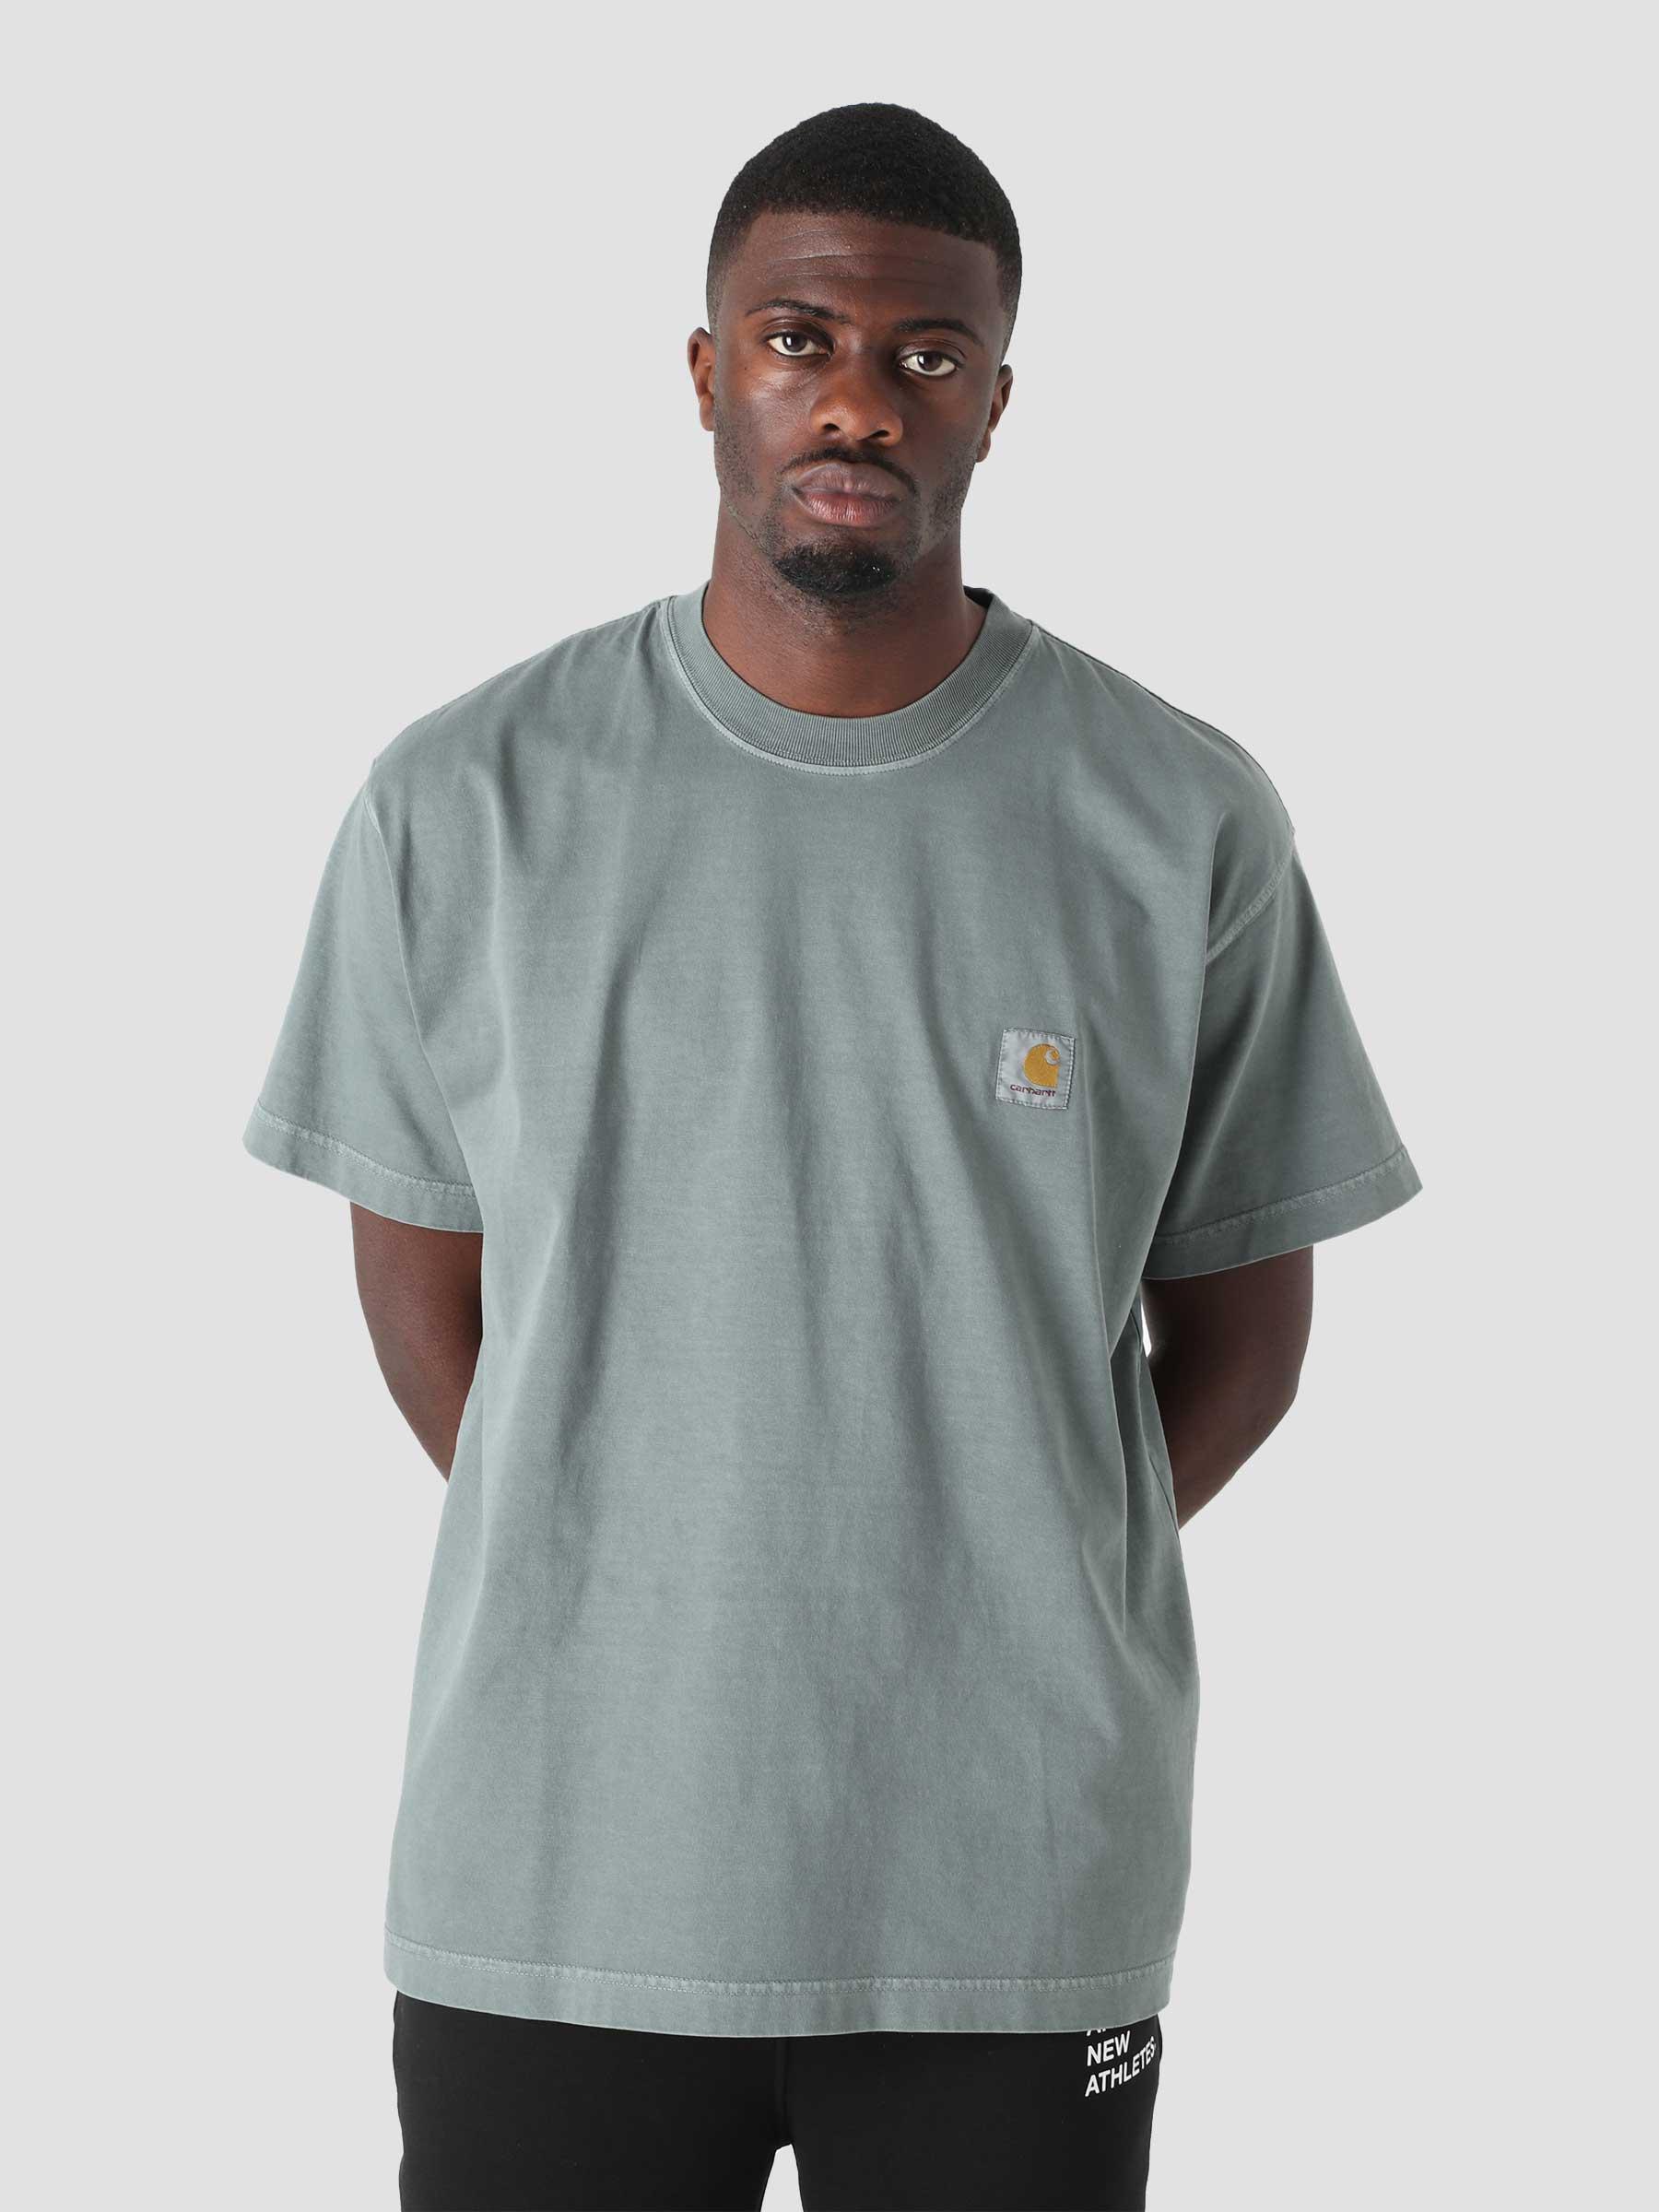 Vista T-Shirt Eucalyptus I029598